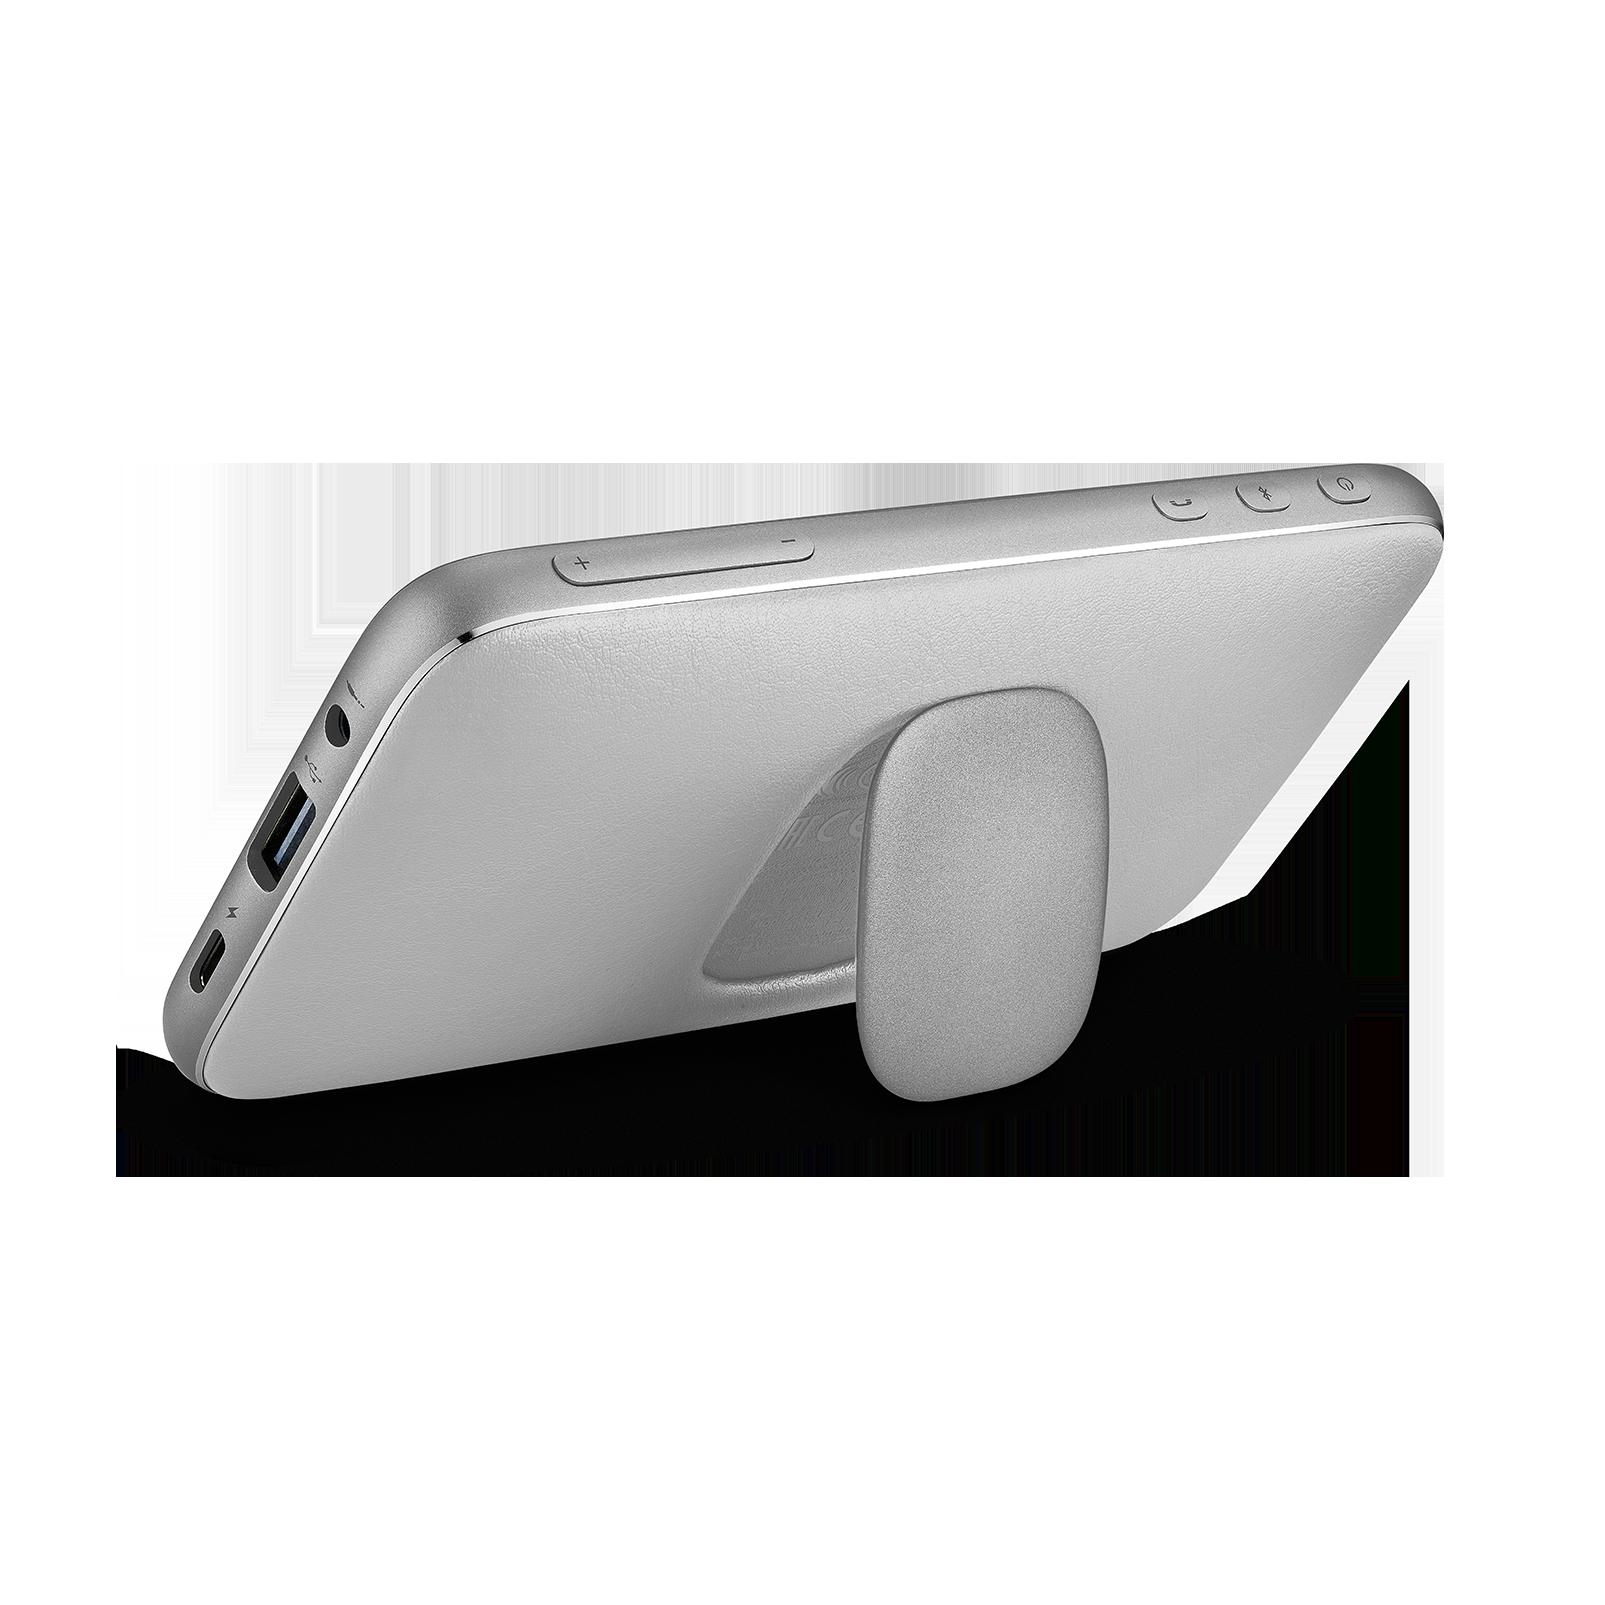 Harman Kardon Esquire Mini 2 - Silver - Ultra-slim and portable premium Bluetooth Speaker - Back